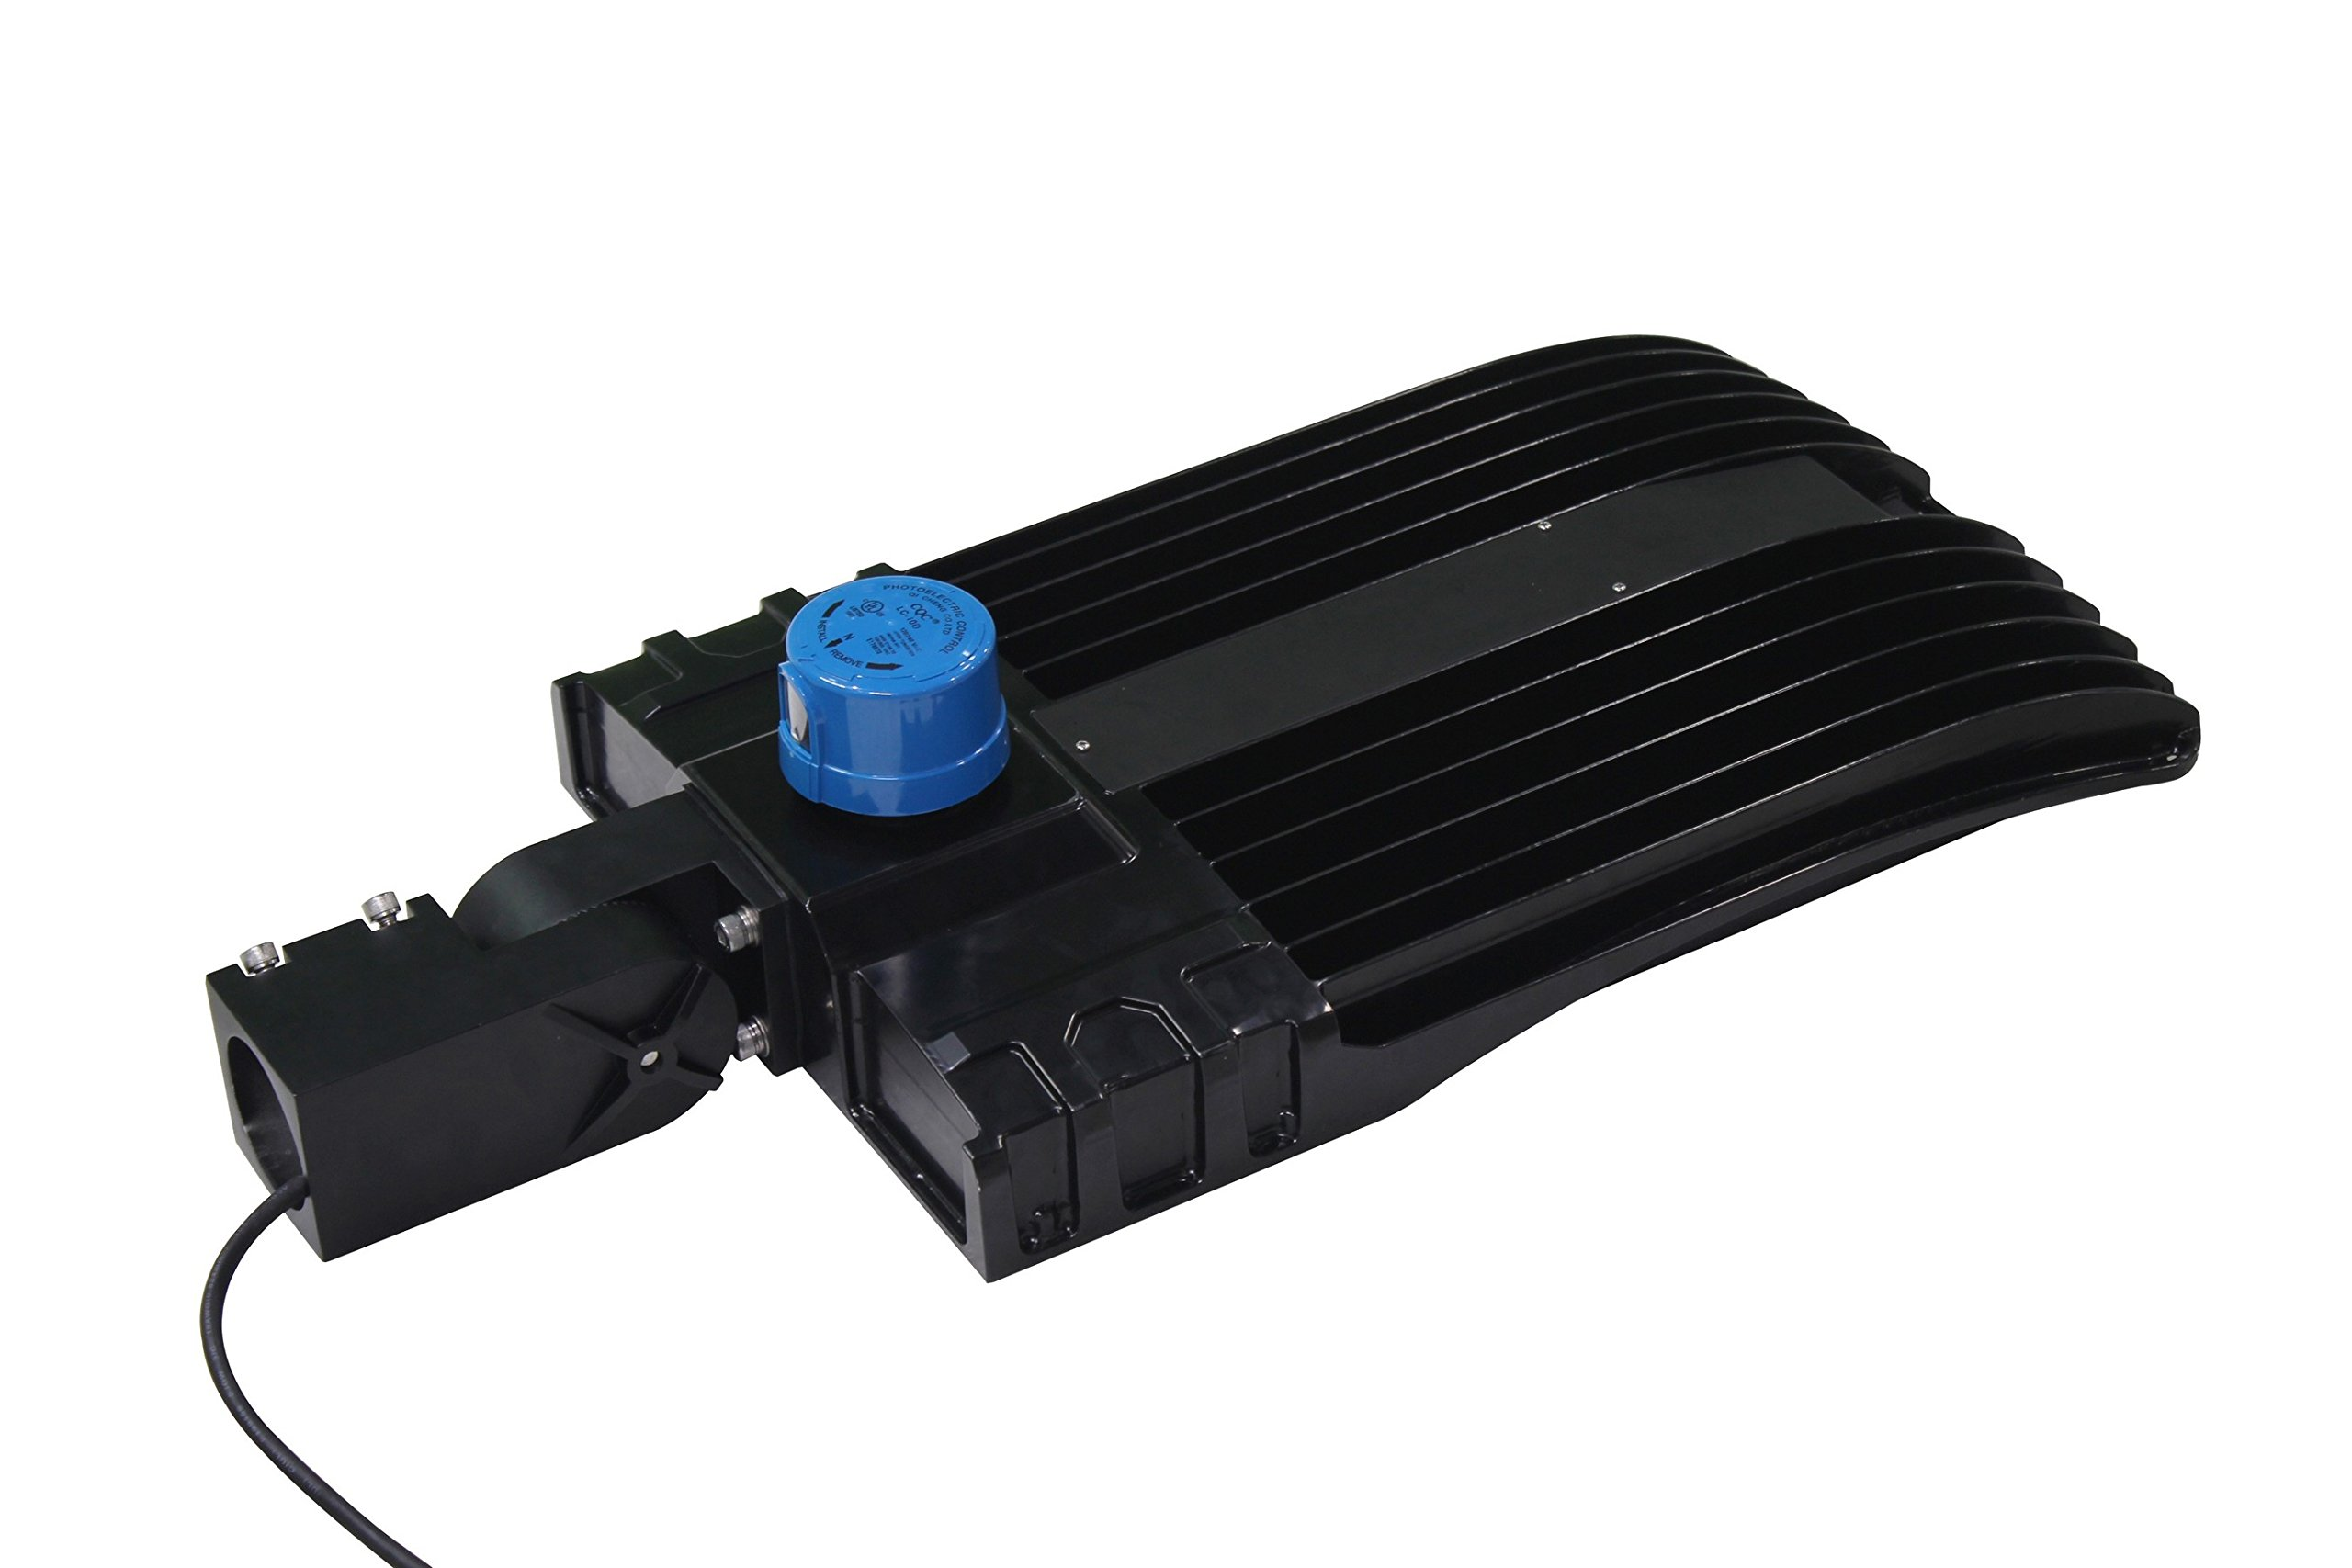 300 Watt NextGen LED Parking Lot Lights - 40,000 Lumen - Super Efficiency 130 Lumen to Watt - 5000K Bright White - Replaces 1000W Halide - LED Shoebox Lights - Slip Fit Mount - With photocell by RuggedGrade (Image #2)